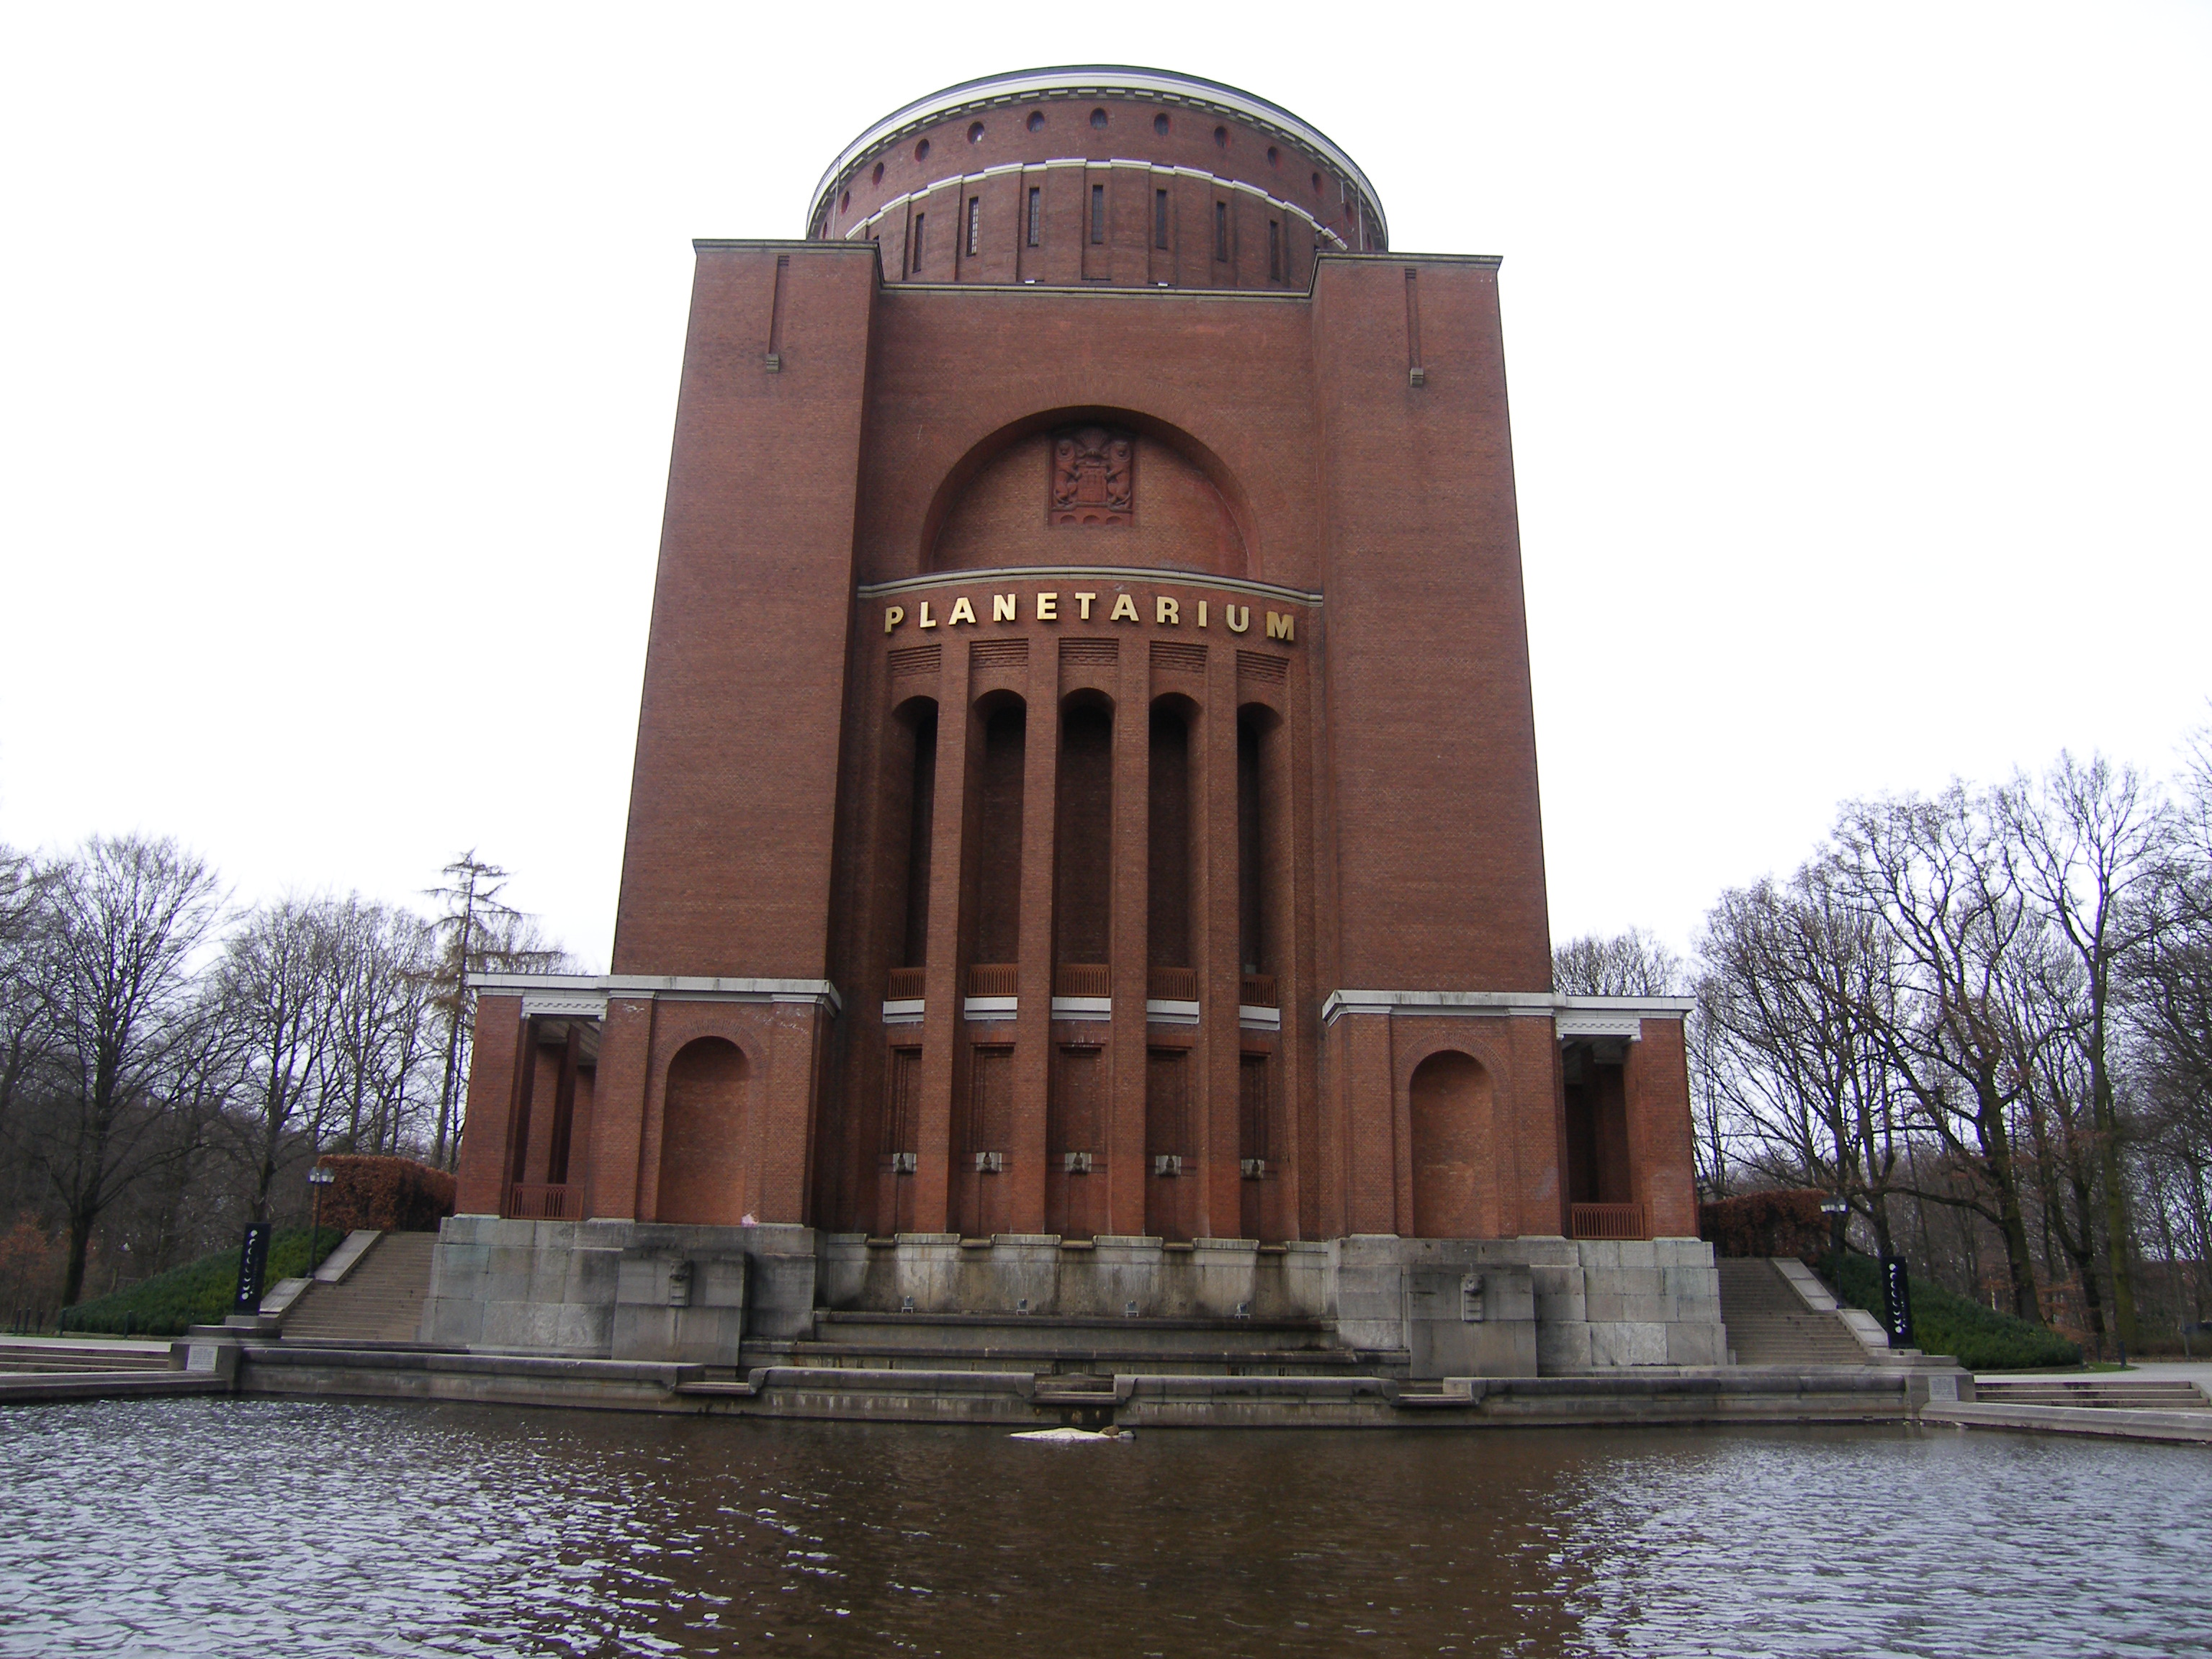 File:Planetarium Hamburg 2009-03-24 (1).jpg - Wikimedia ...  File:Planetariu...